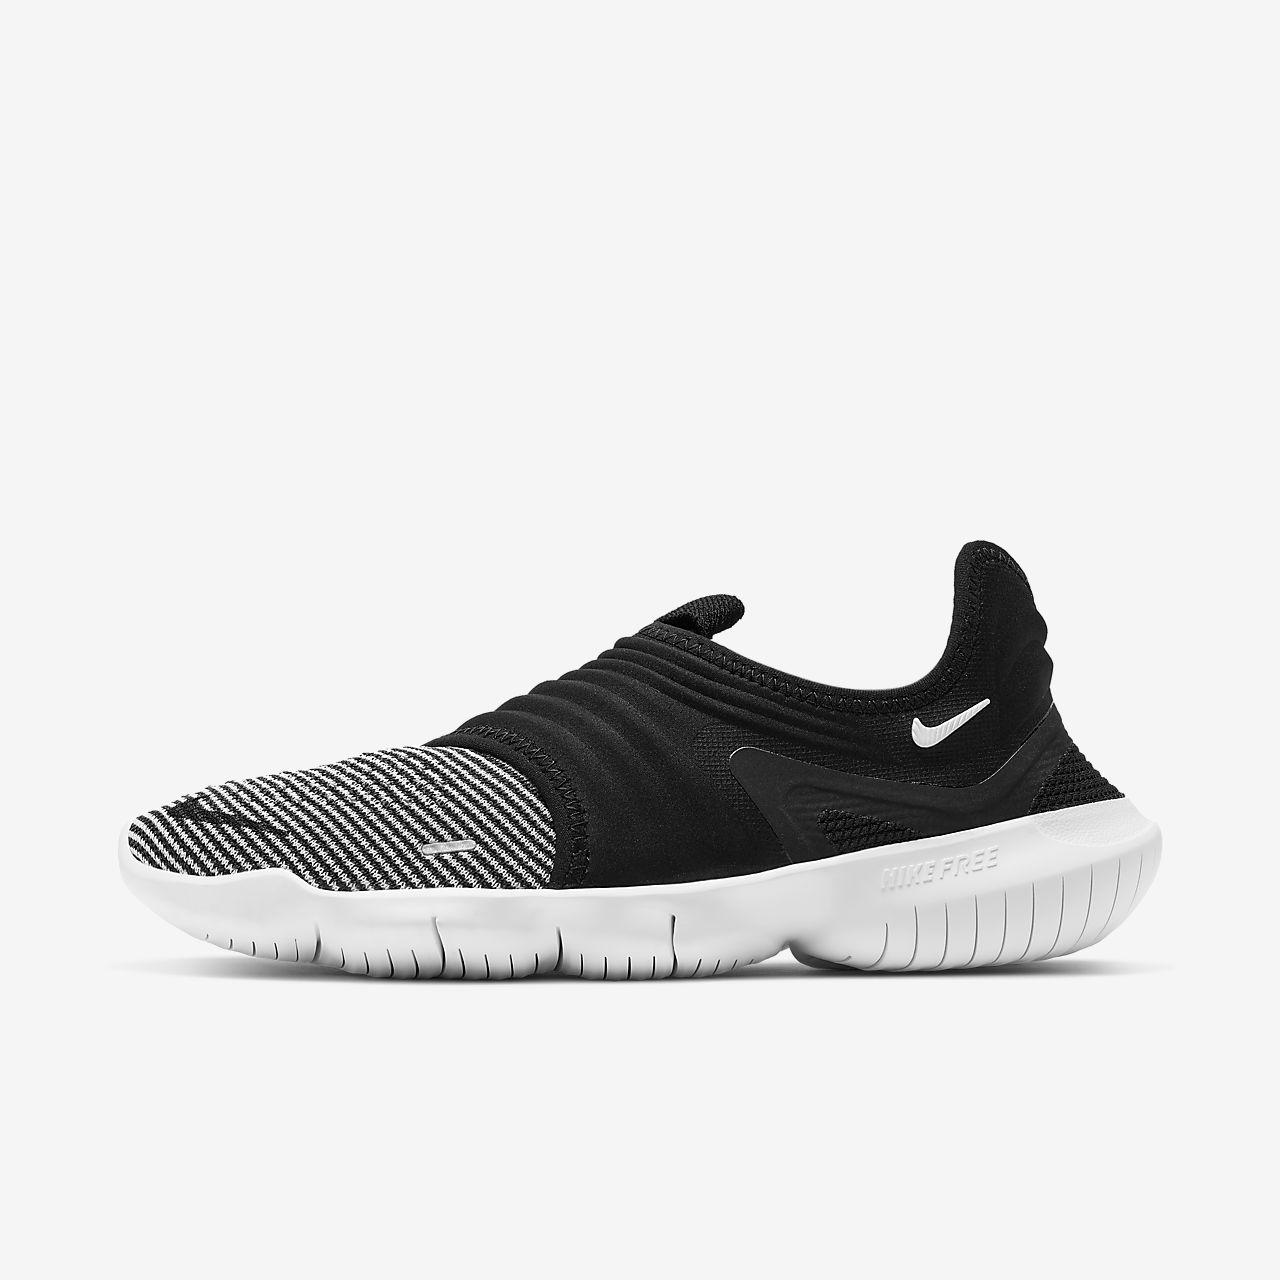 Sapatilhas de running Nike Free RN Flyknit 3.0 para mulher